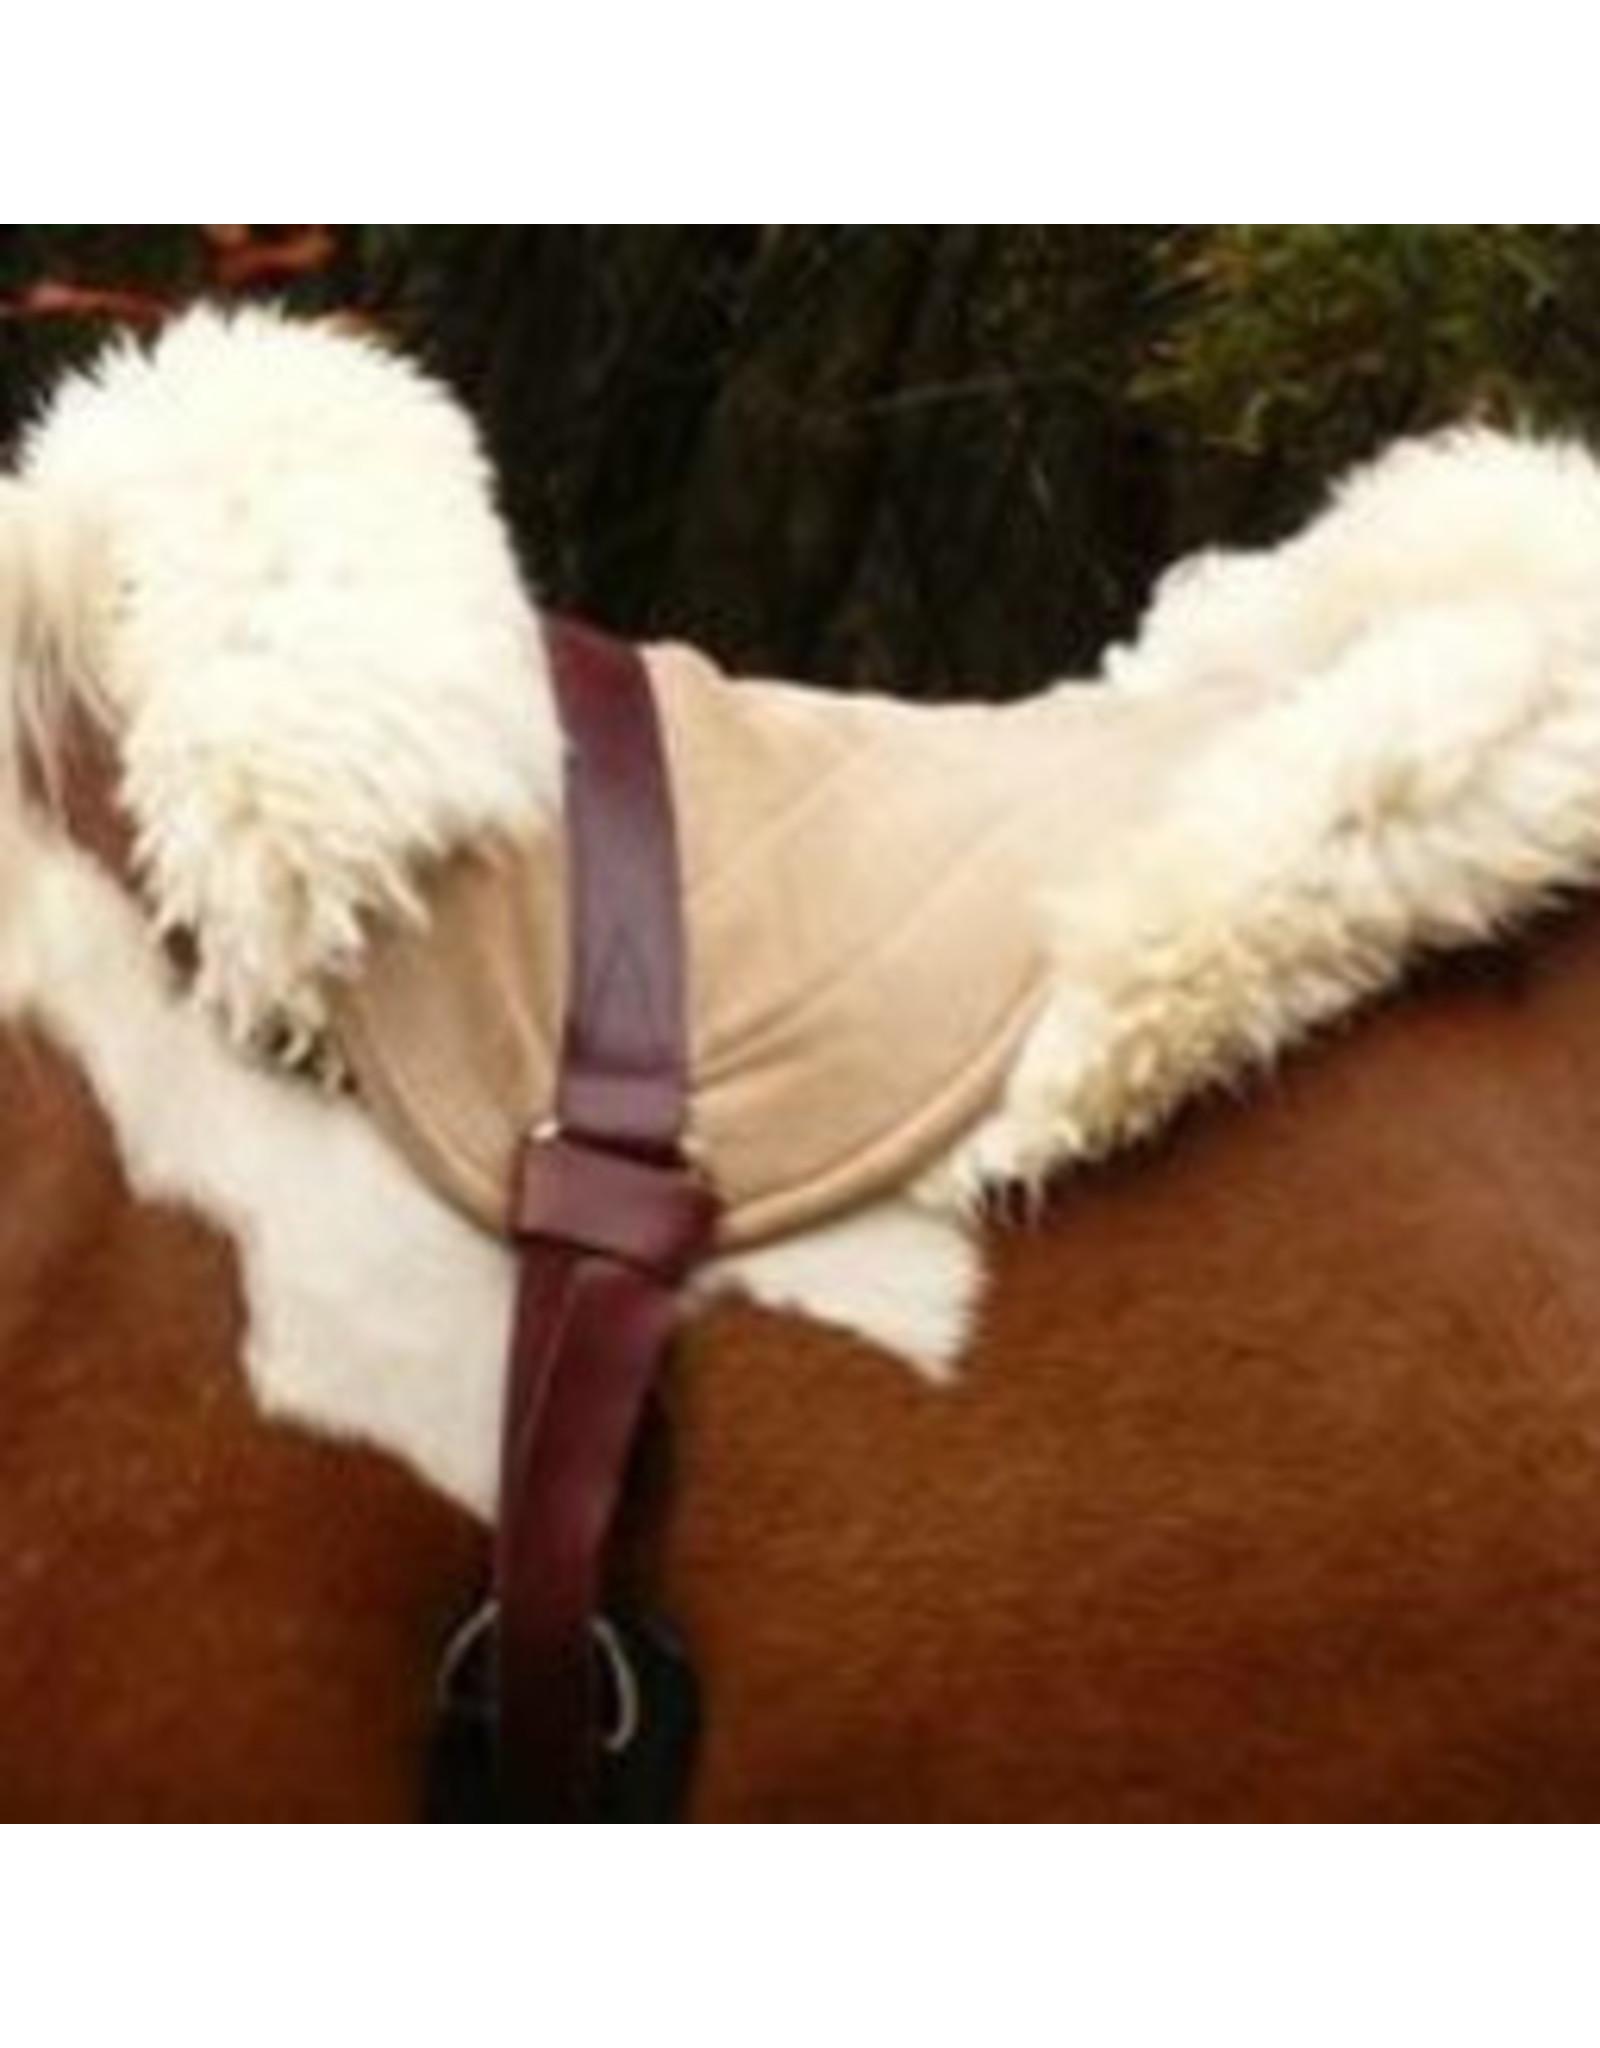 Seilerei Brockamp Horsemanship wildleder Reitkissen